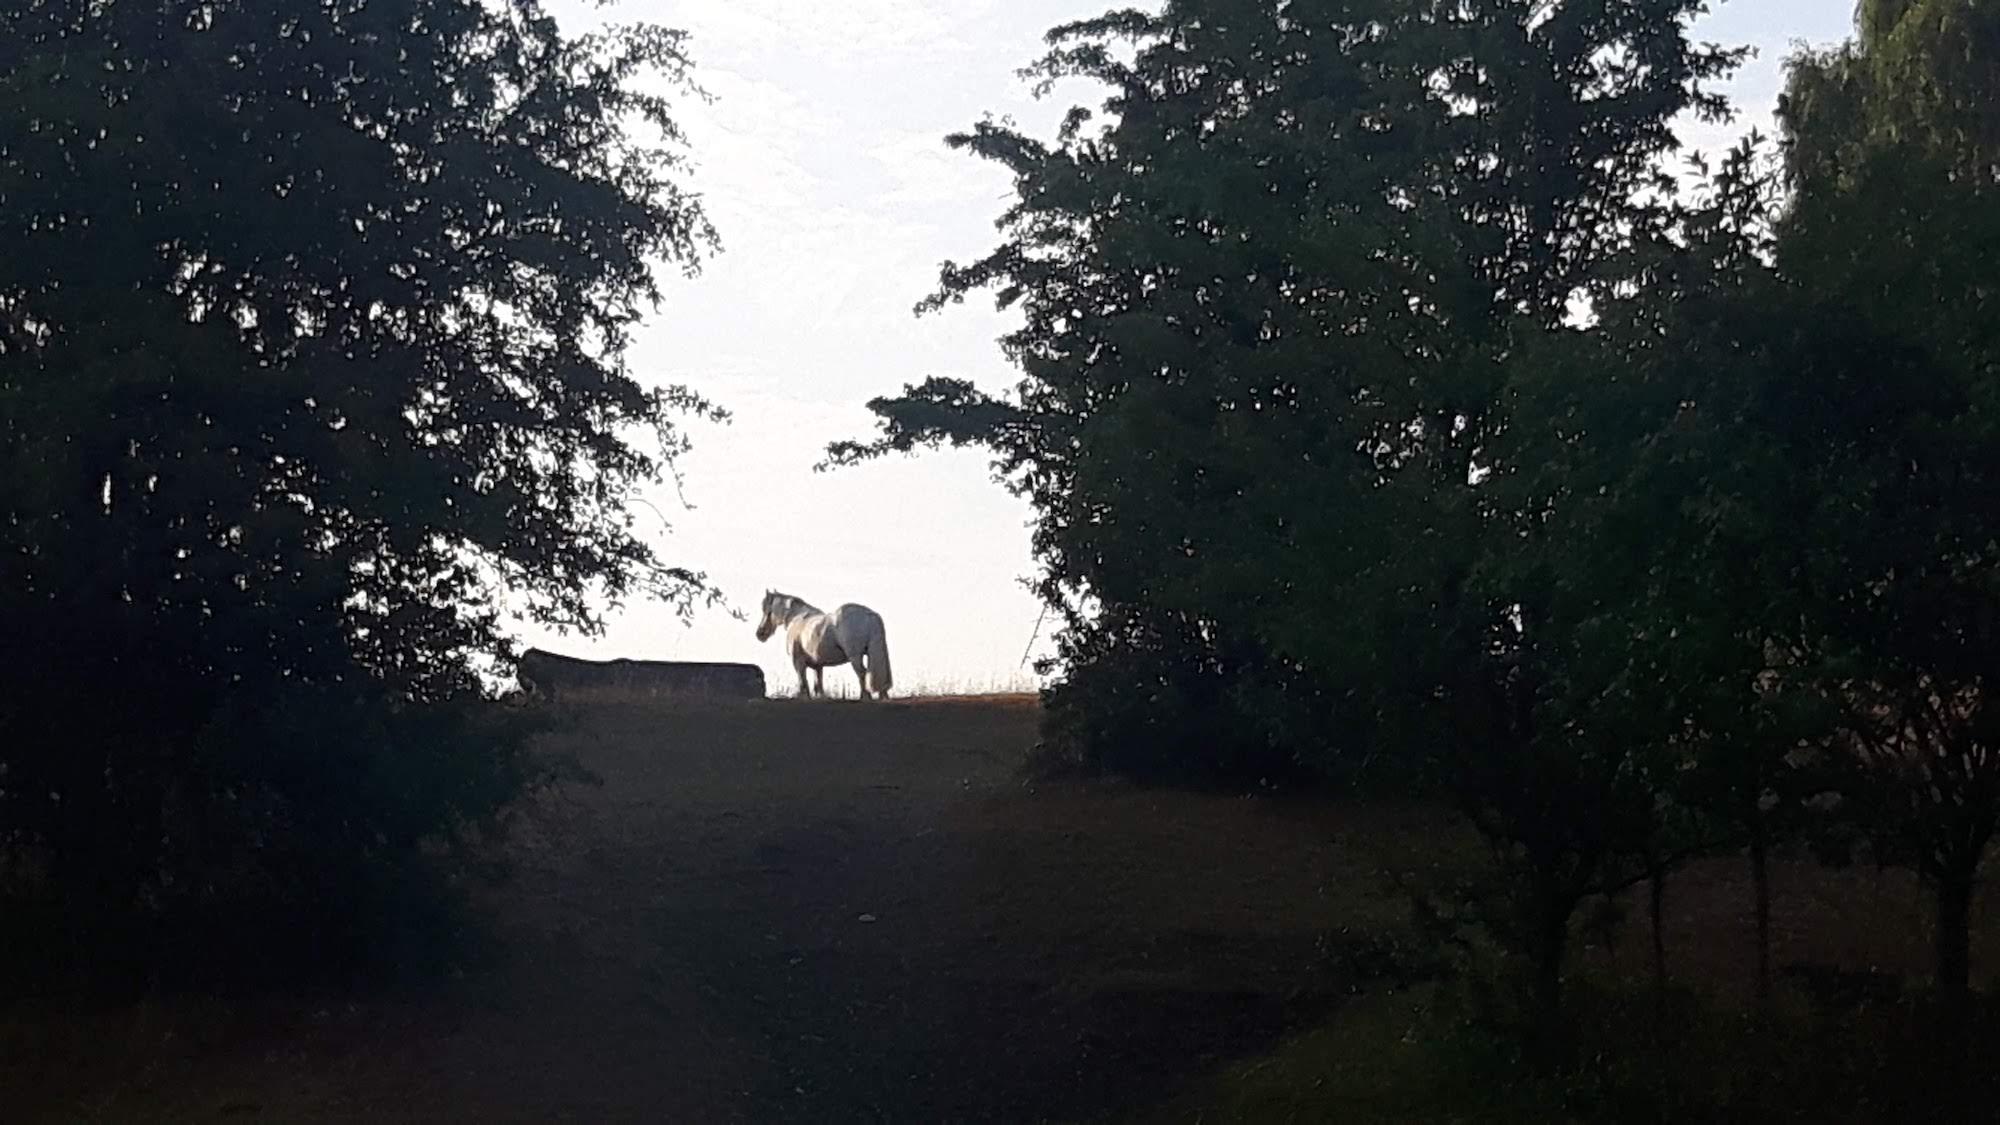 A horse in Denmark